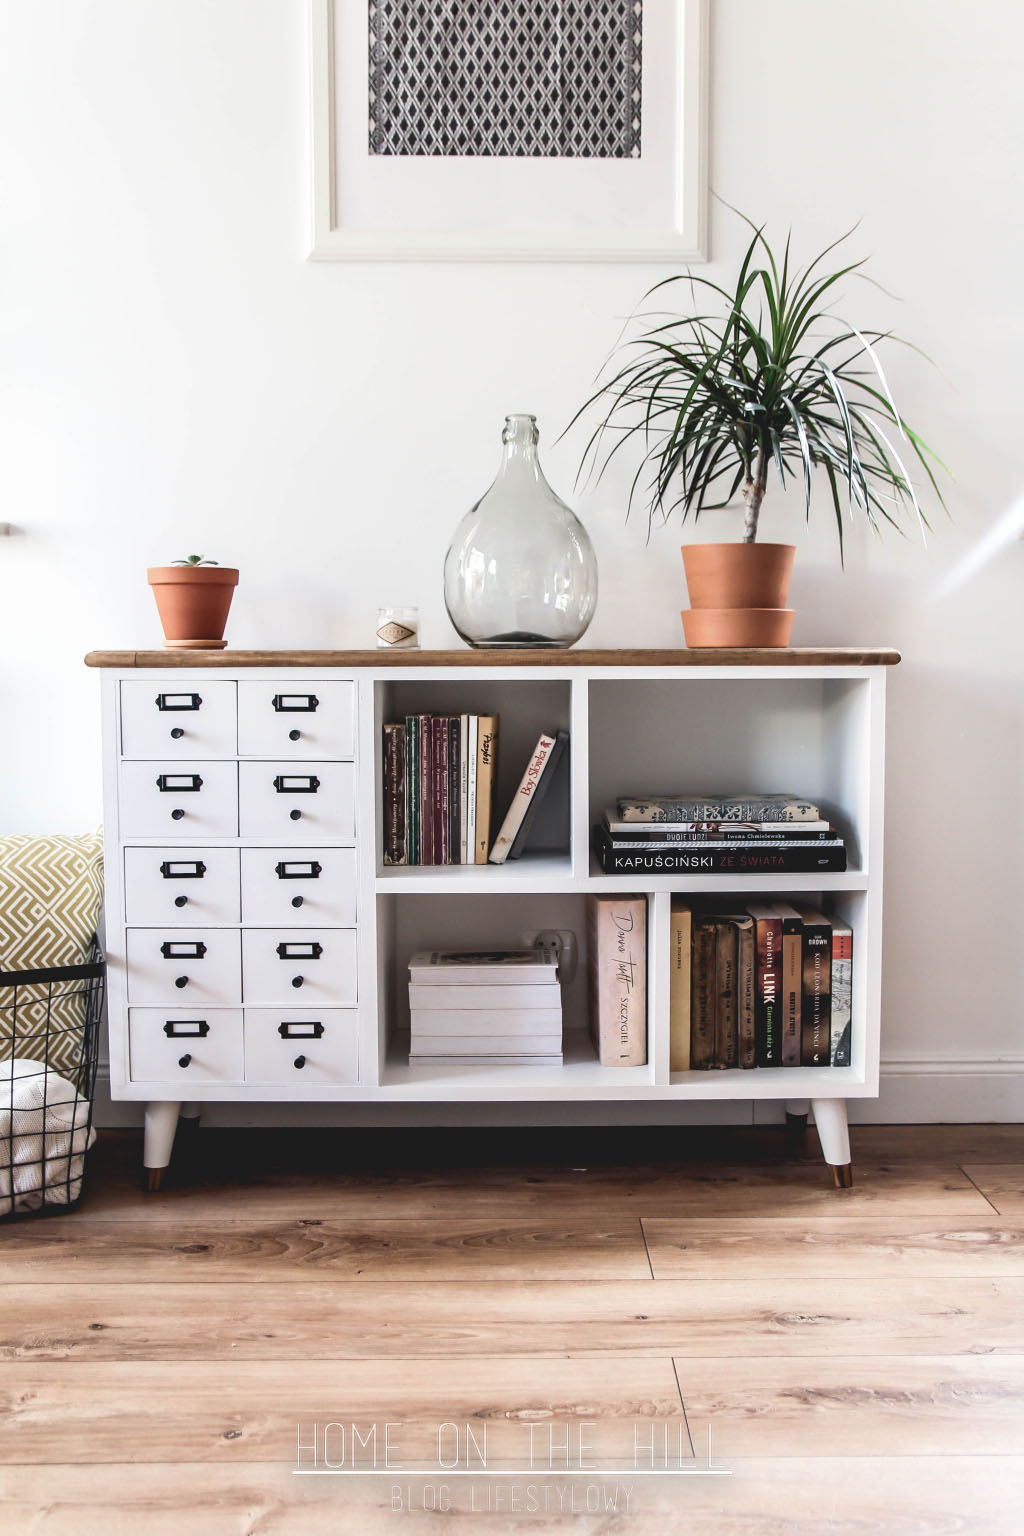 DIY-meble-pomysły